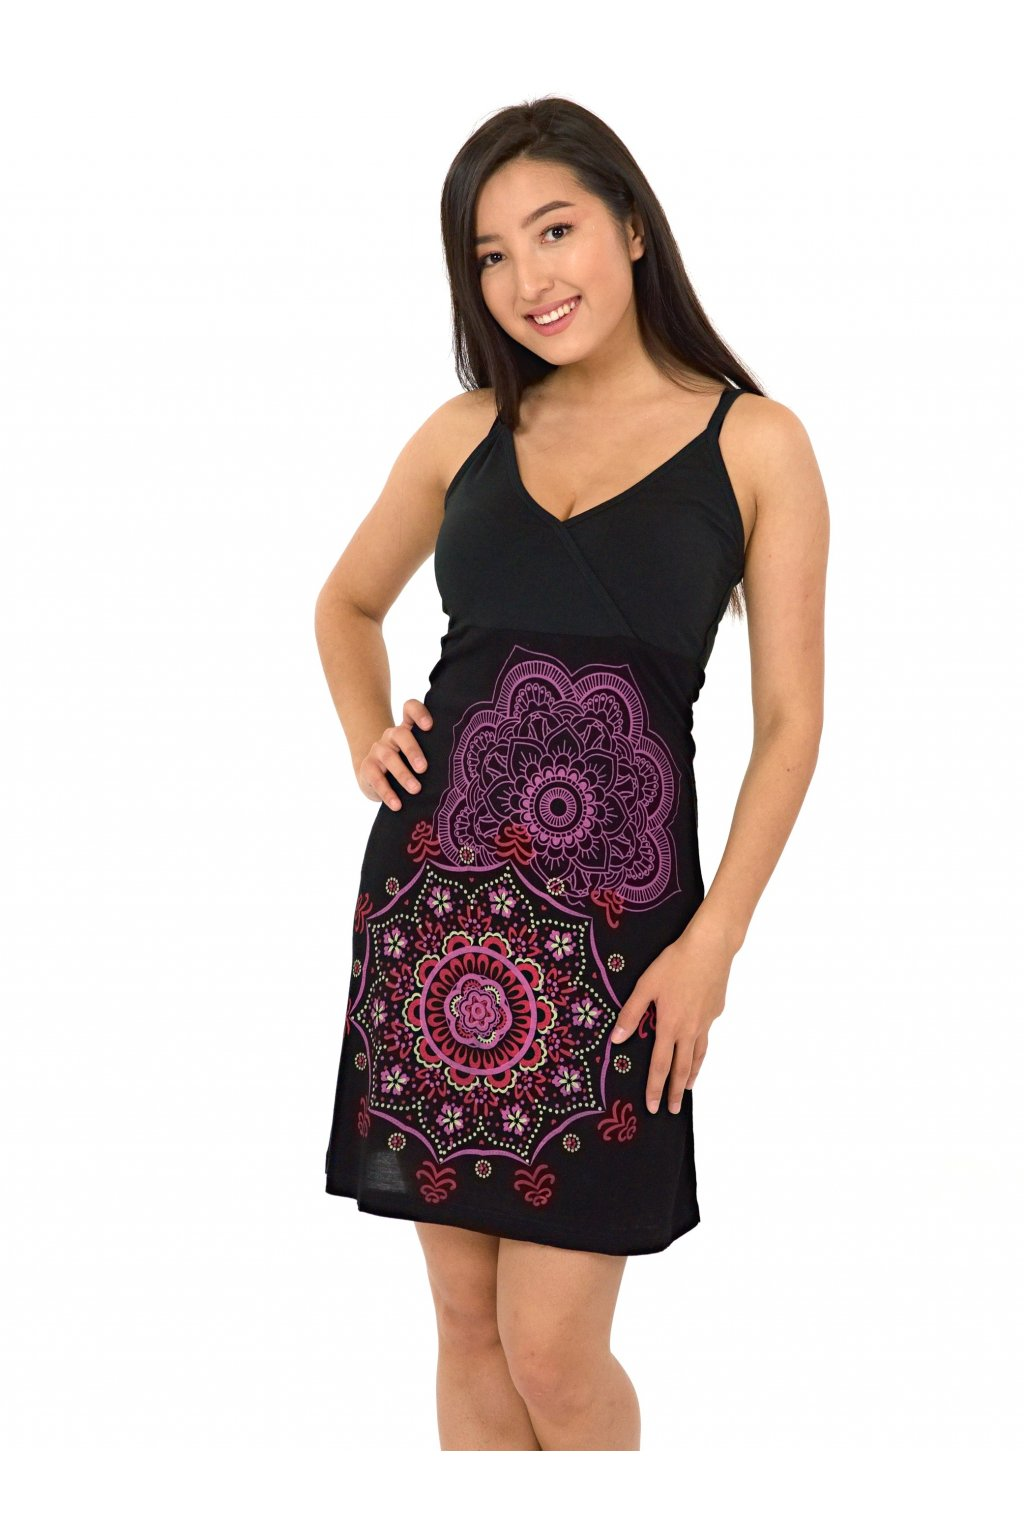 Šaty Akaroa - černá se růžovou